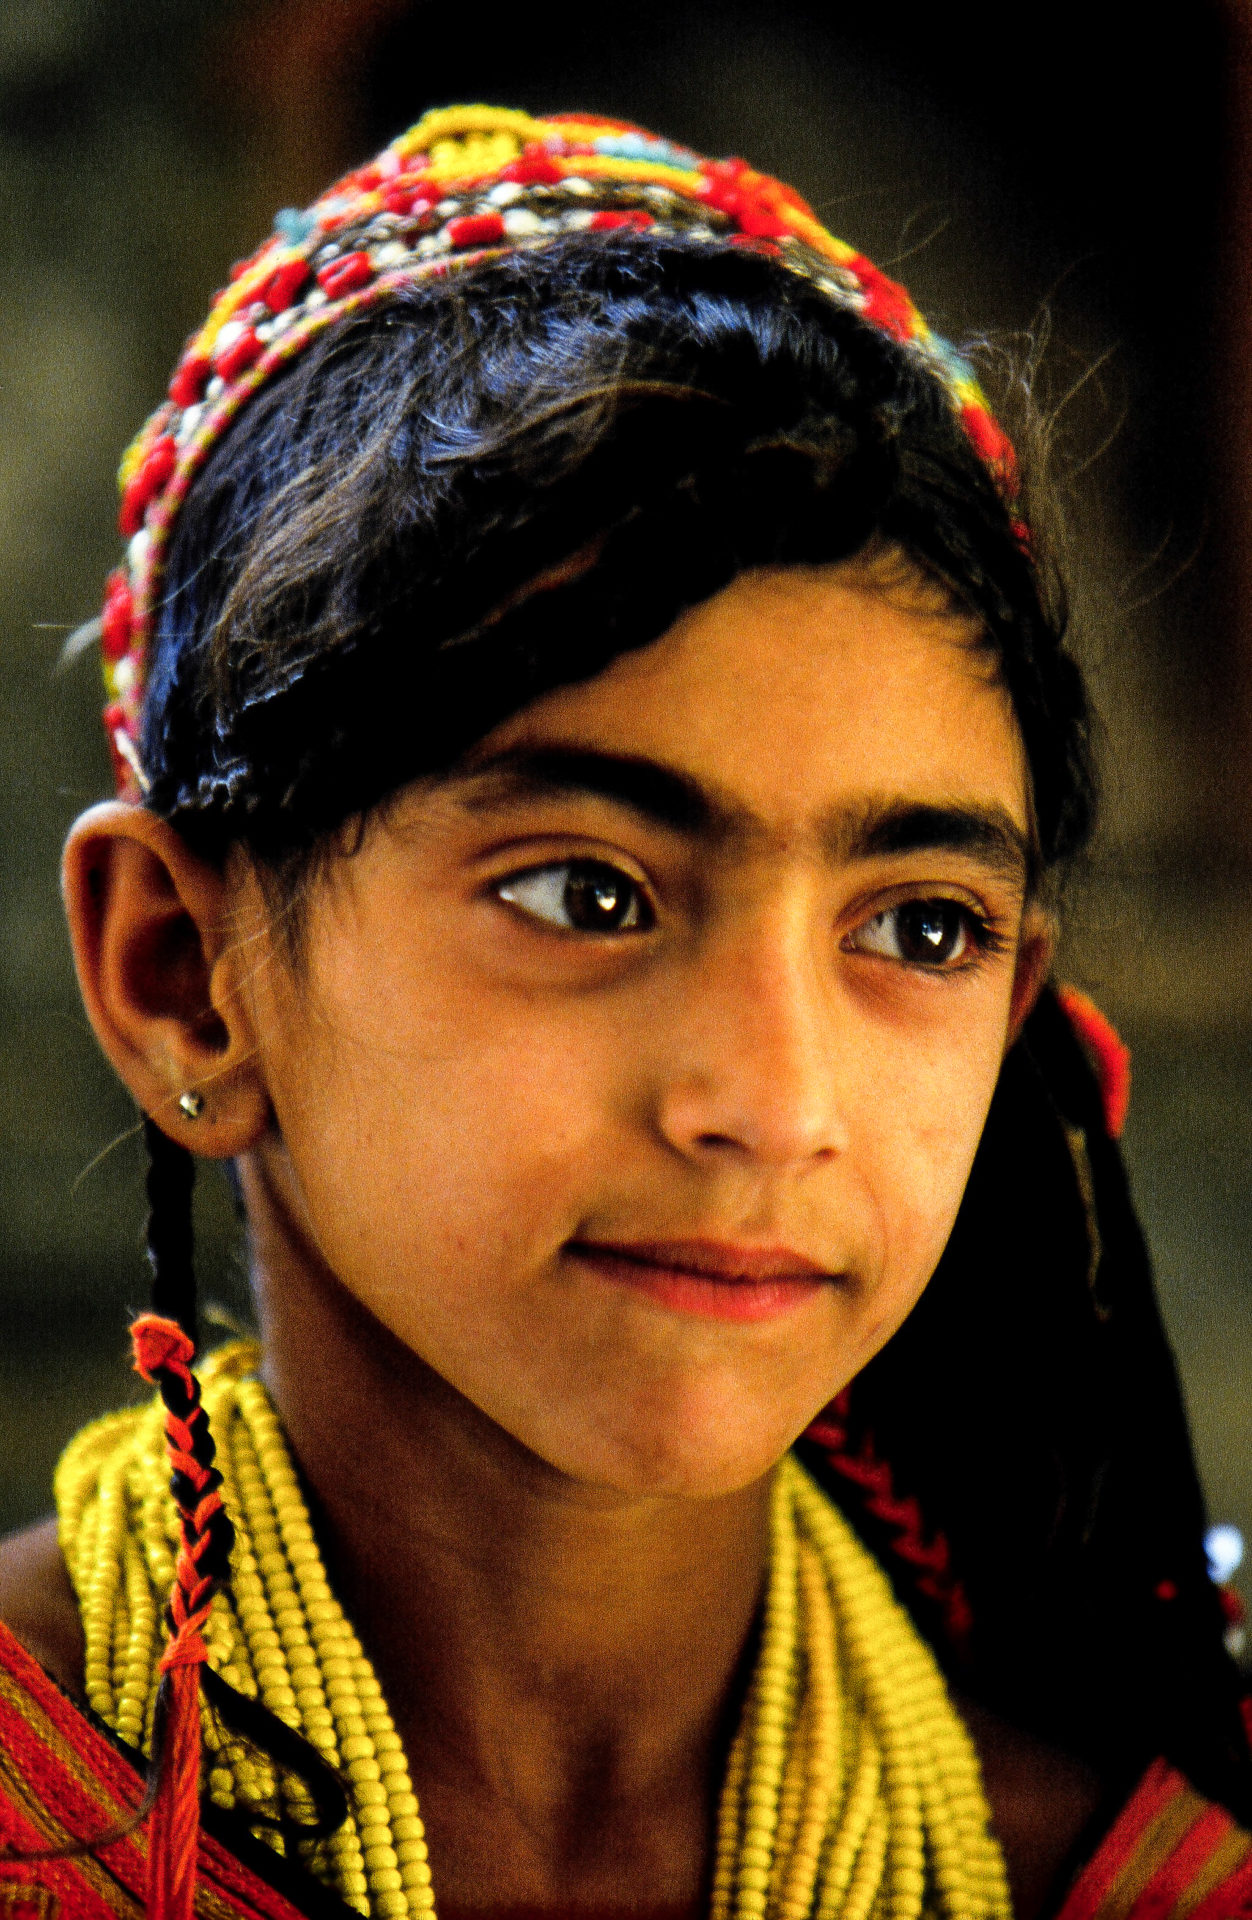 Pakistan 2005 # 06